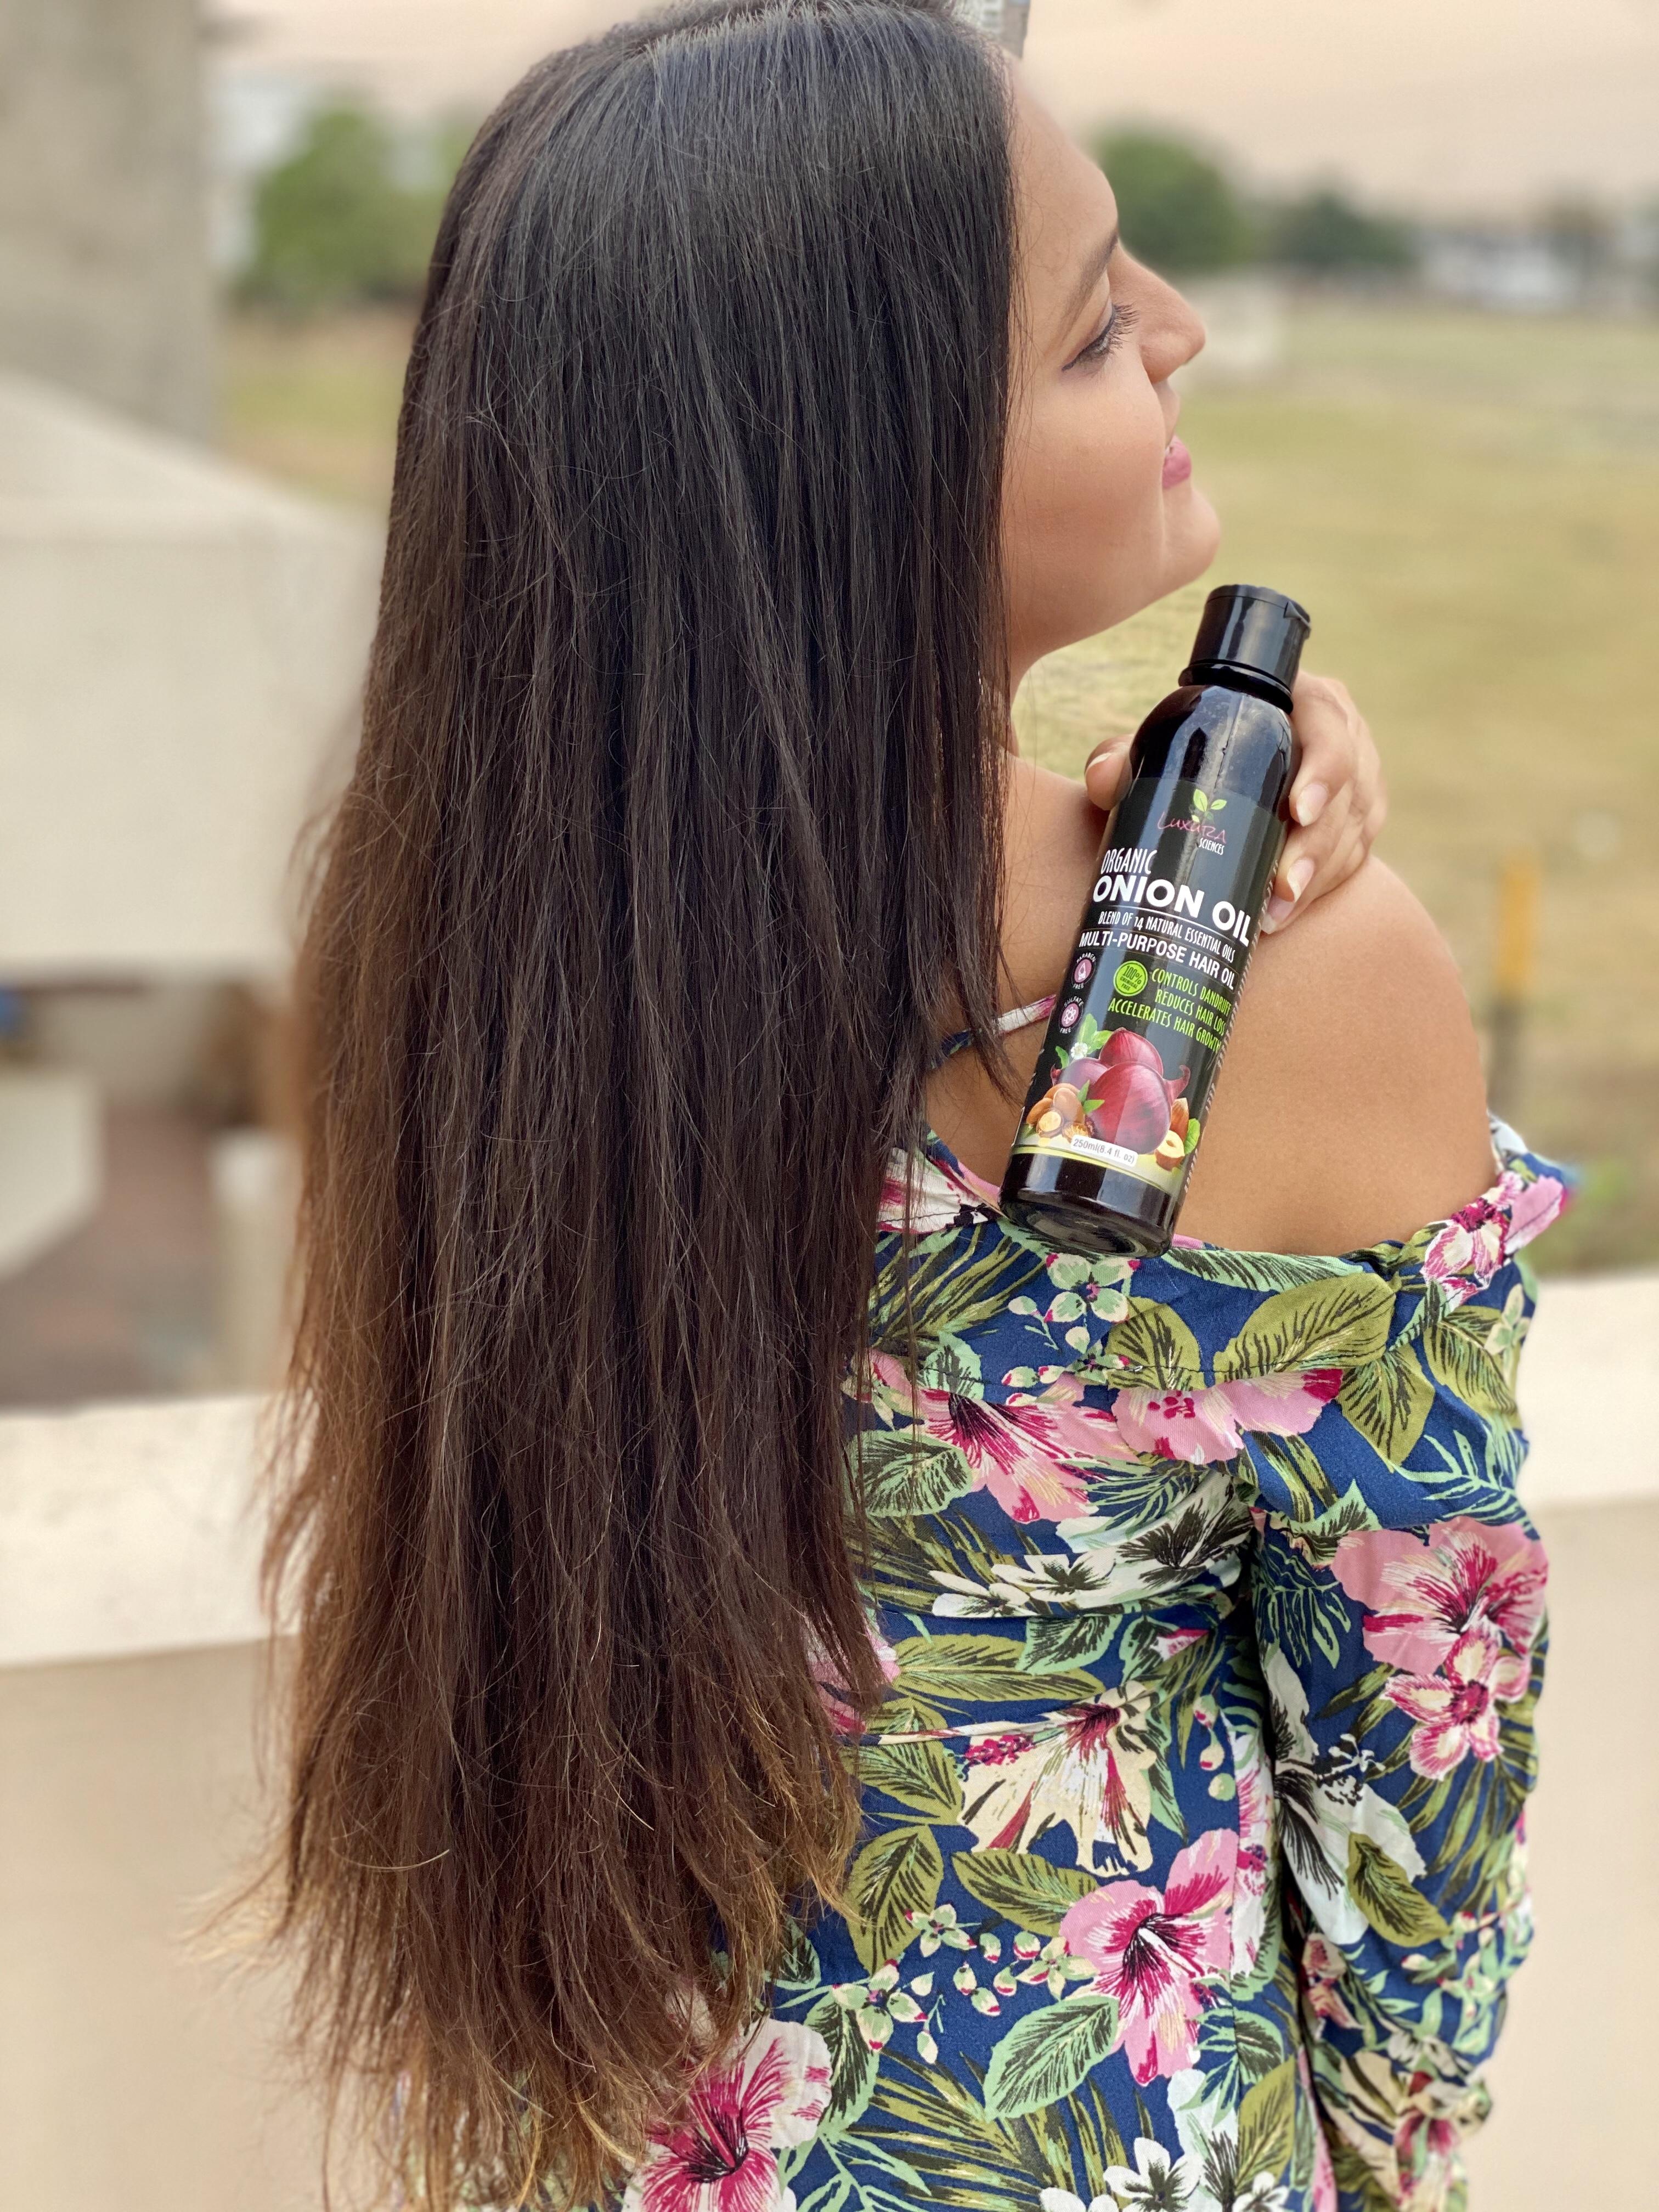 Luxura Sciences Onion Hair Oil 250 ml-Good hair oil-By mansigandhi98-2